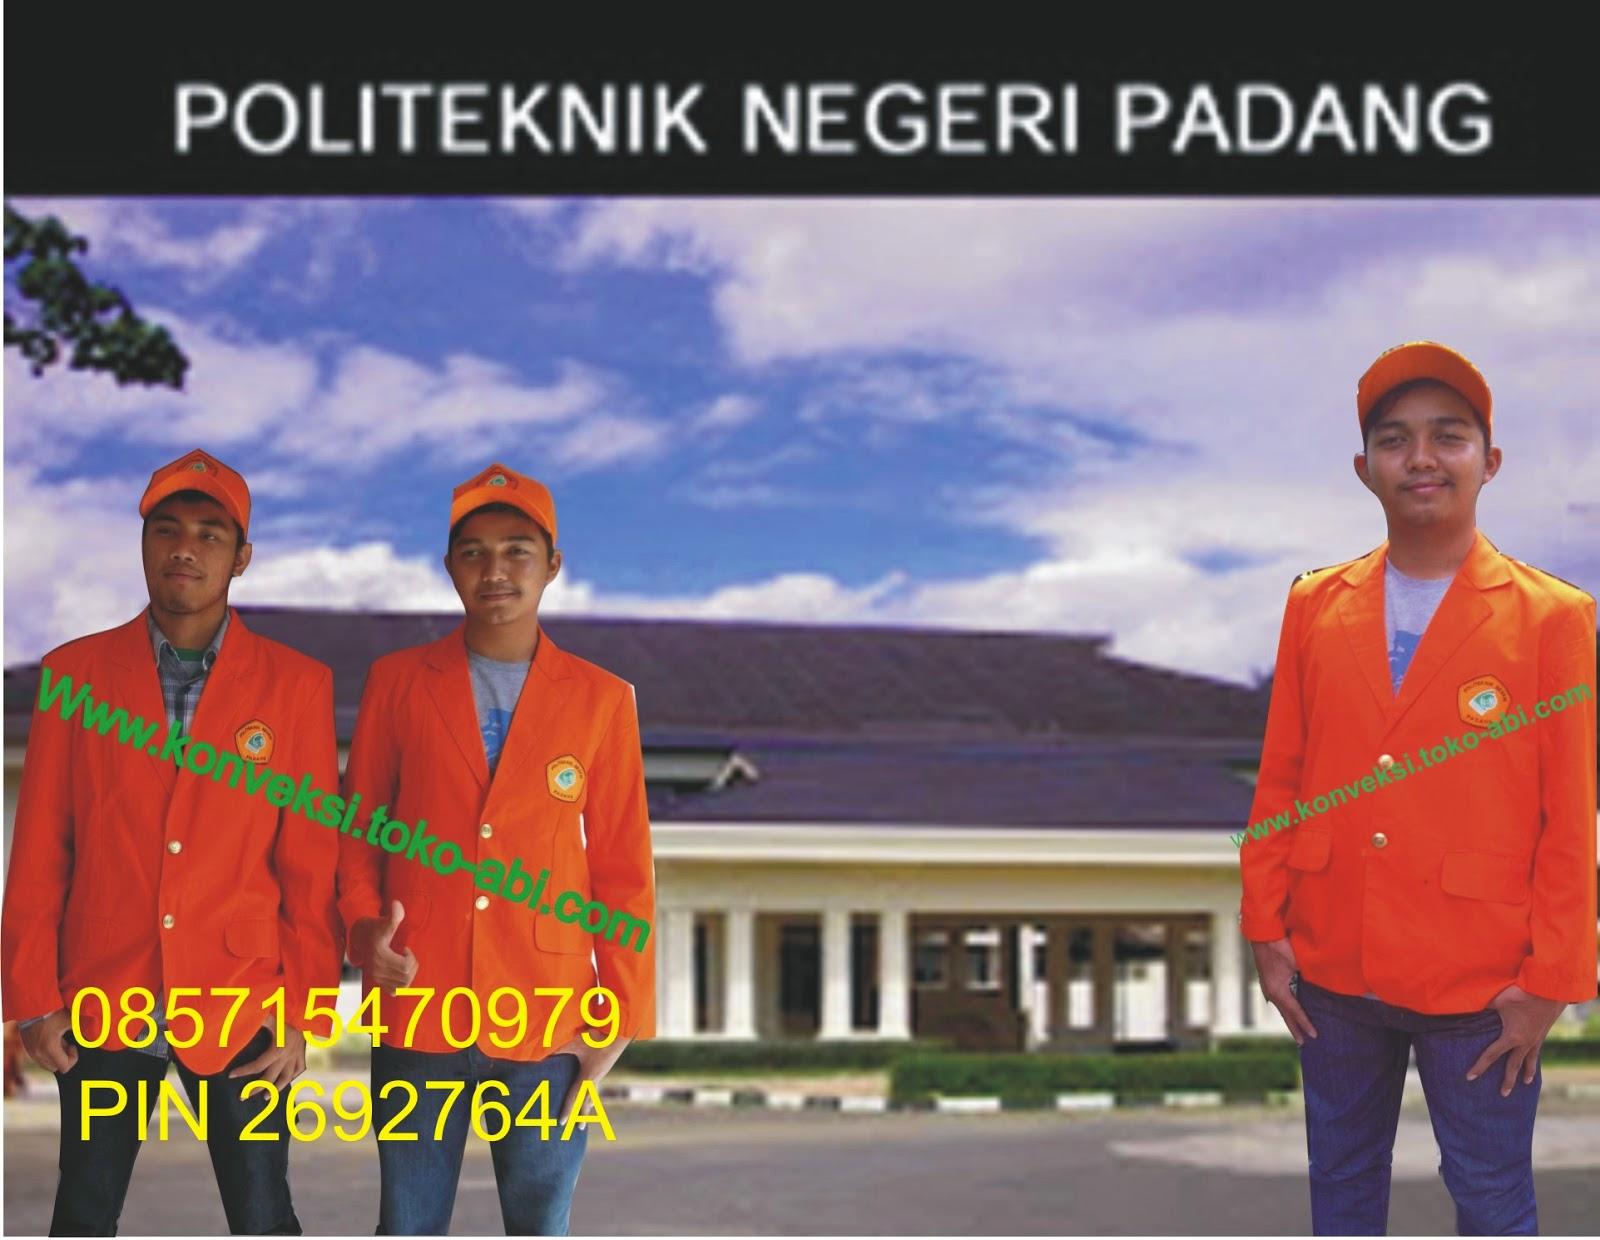 Indonesia unnes semarang part 4 - 5 3